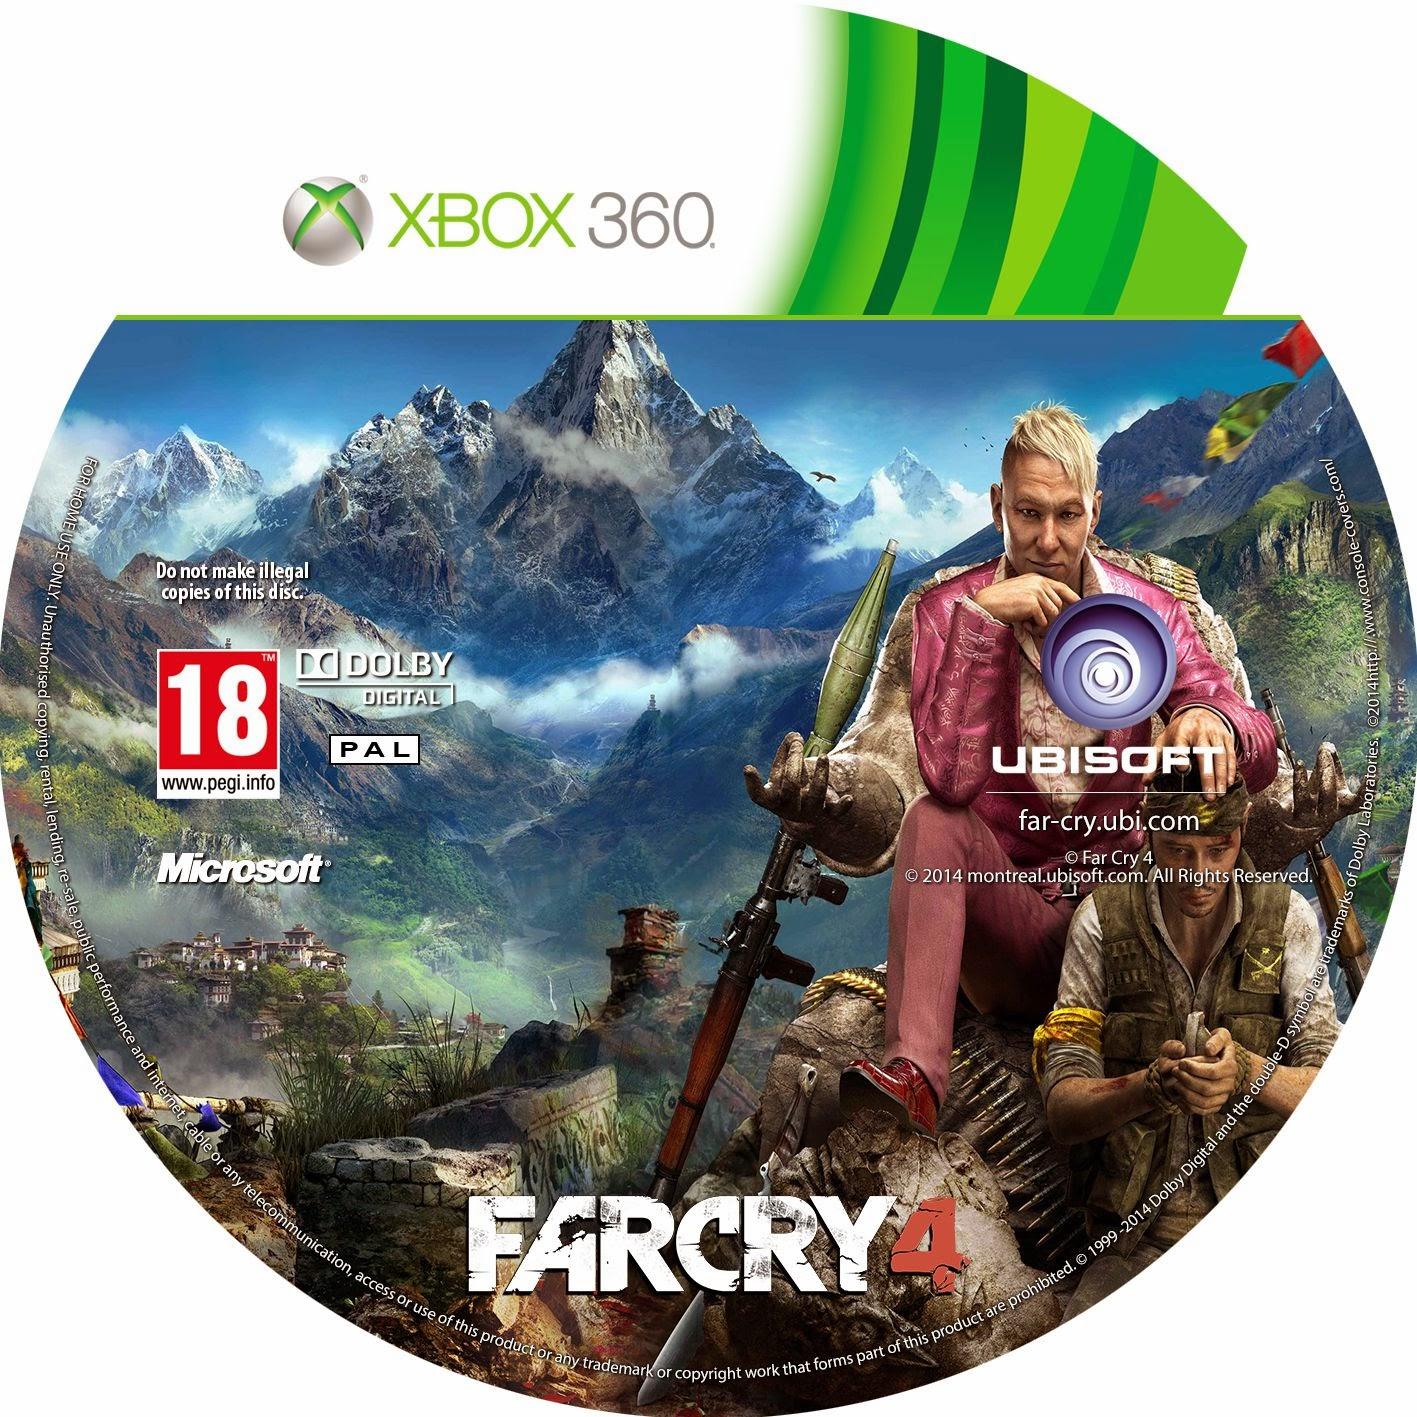 Download FarCry 4 Xbox 360 - Dublado pt-br Torrent